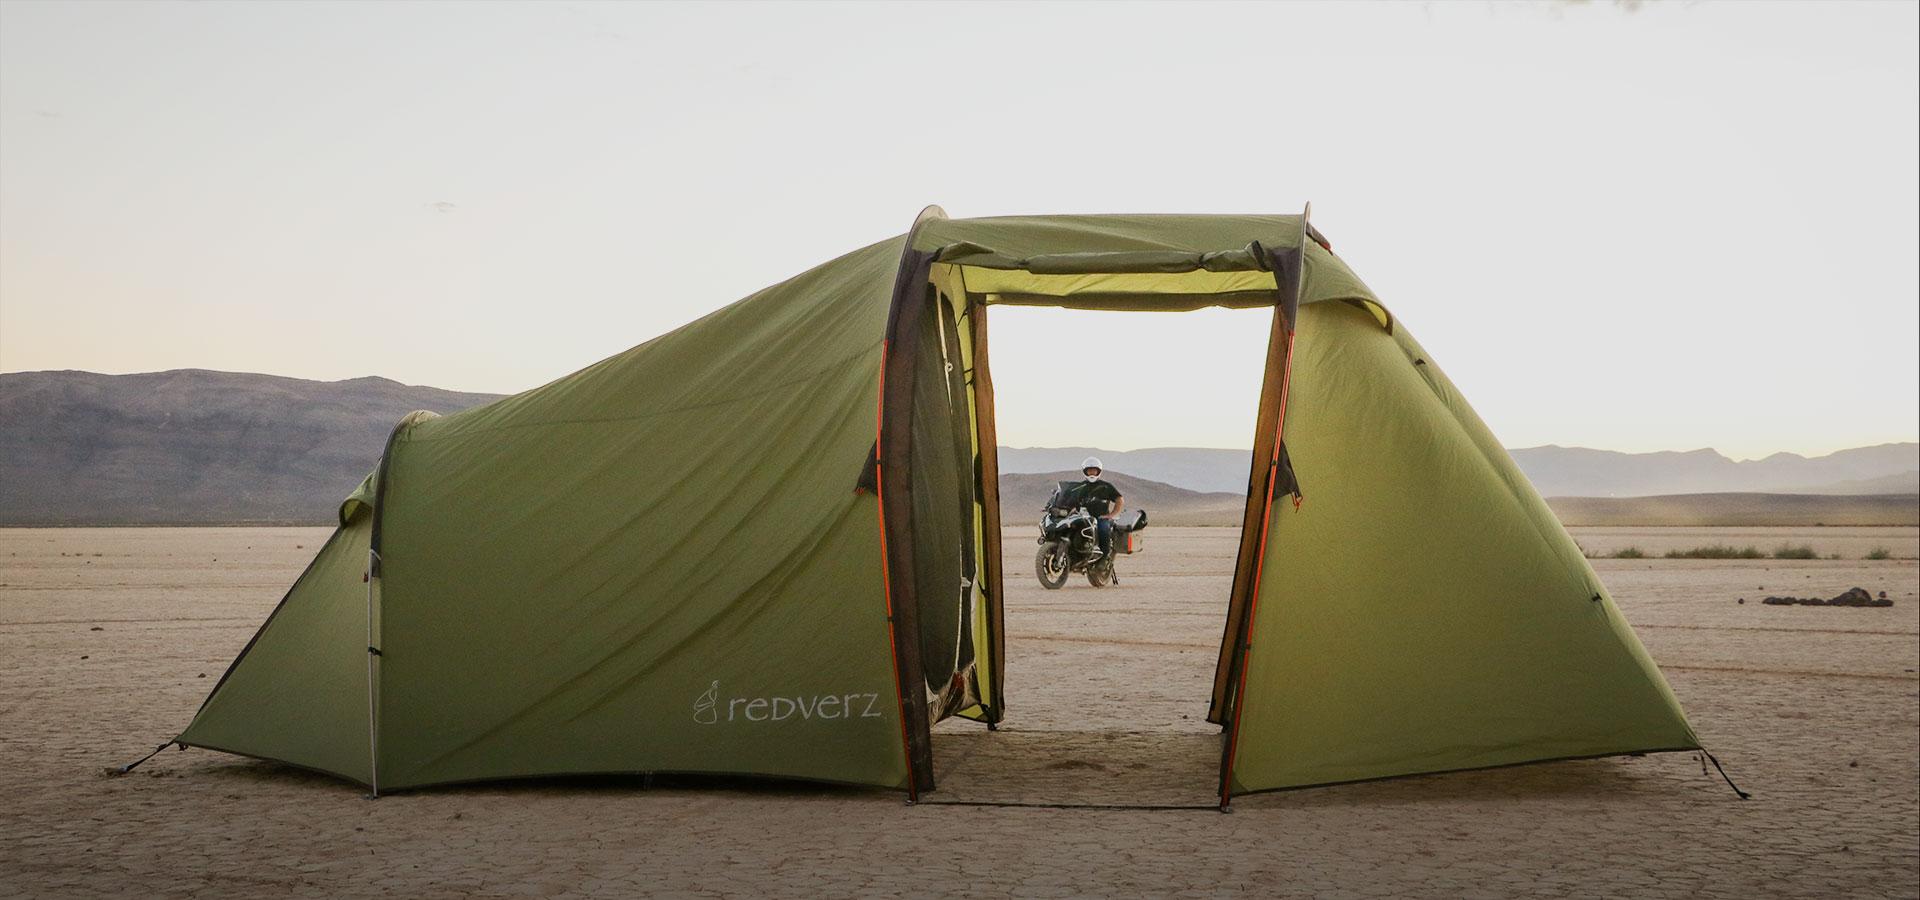 Redverz Tents